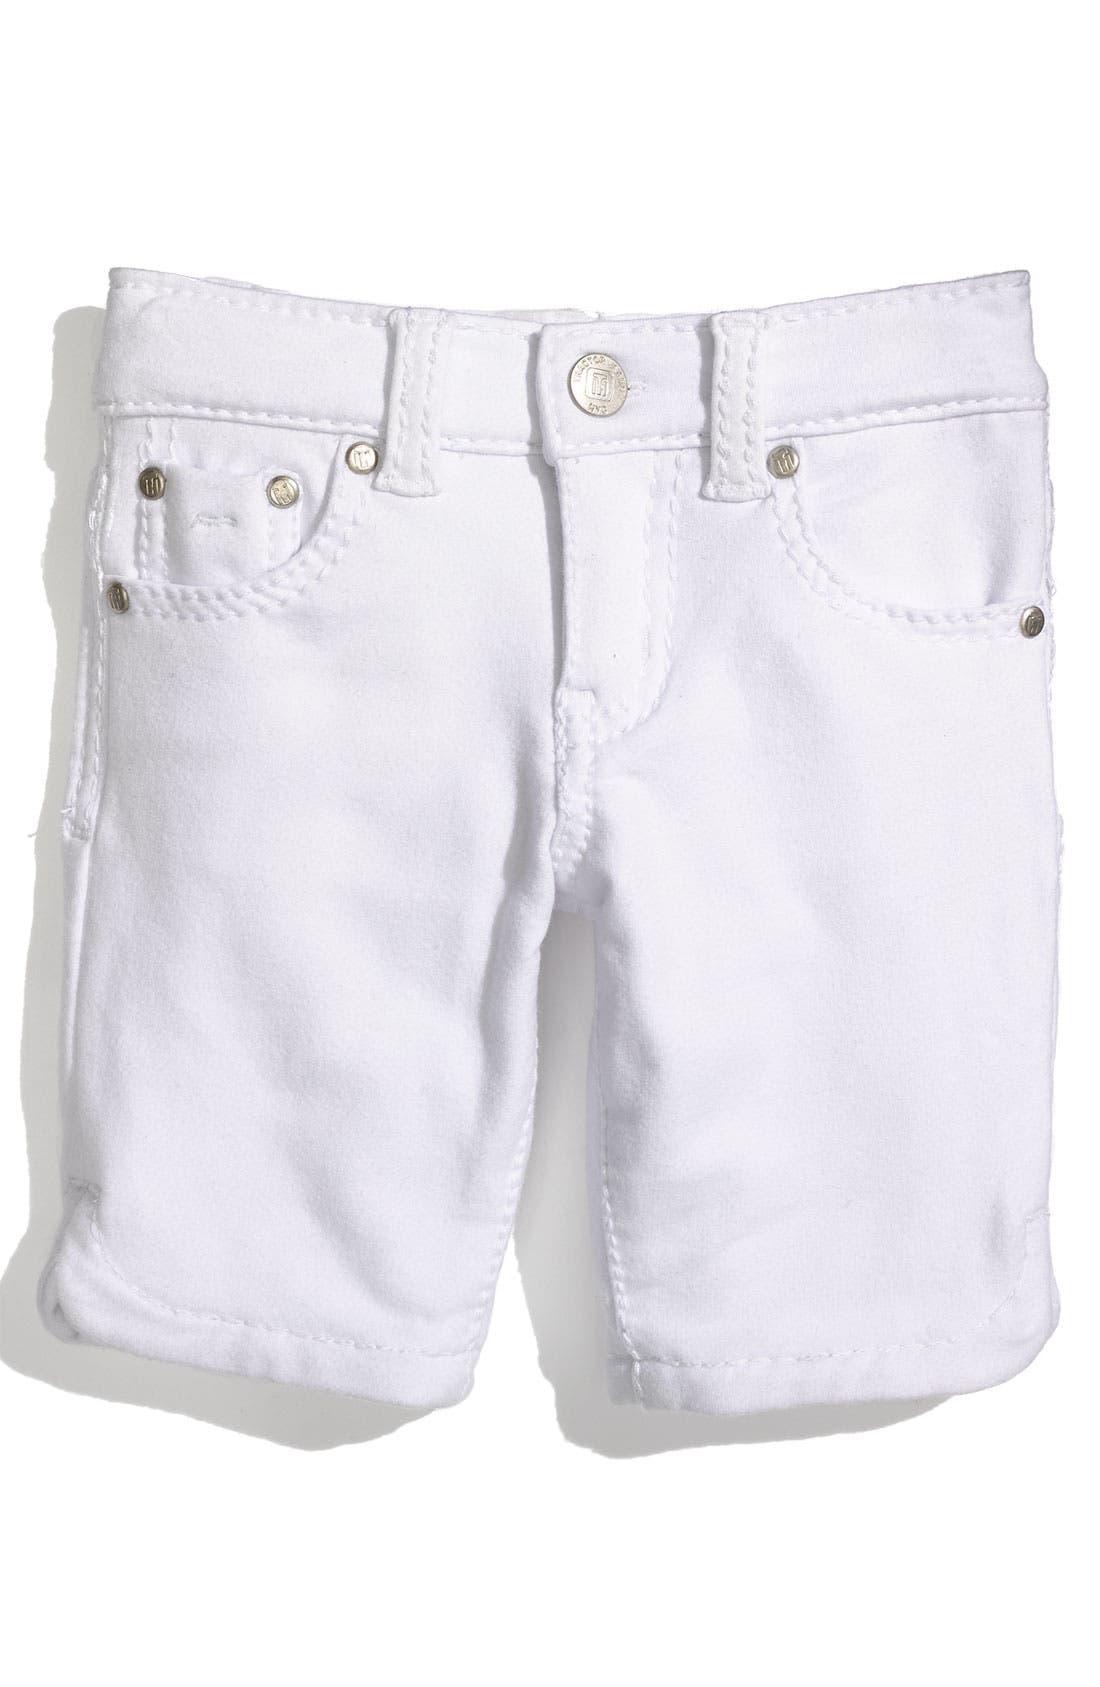 TRACTR,                             Heart Pocket Bermuda Shorts,                             Alternate thumbnail 2, color,                             100